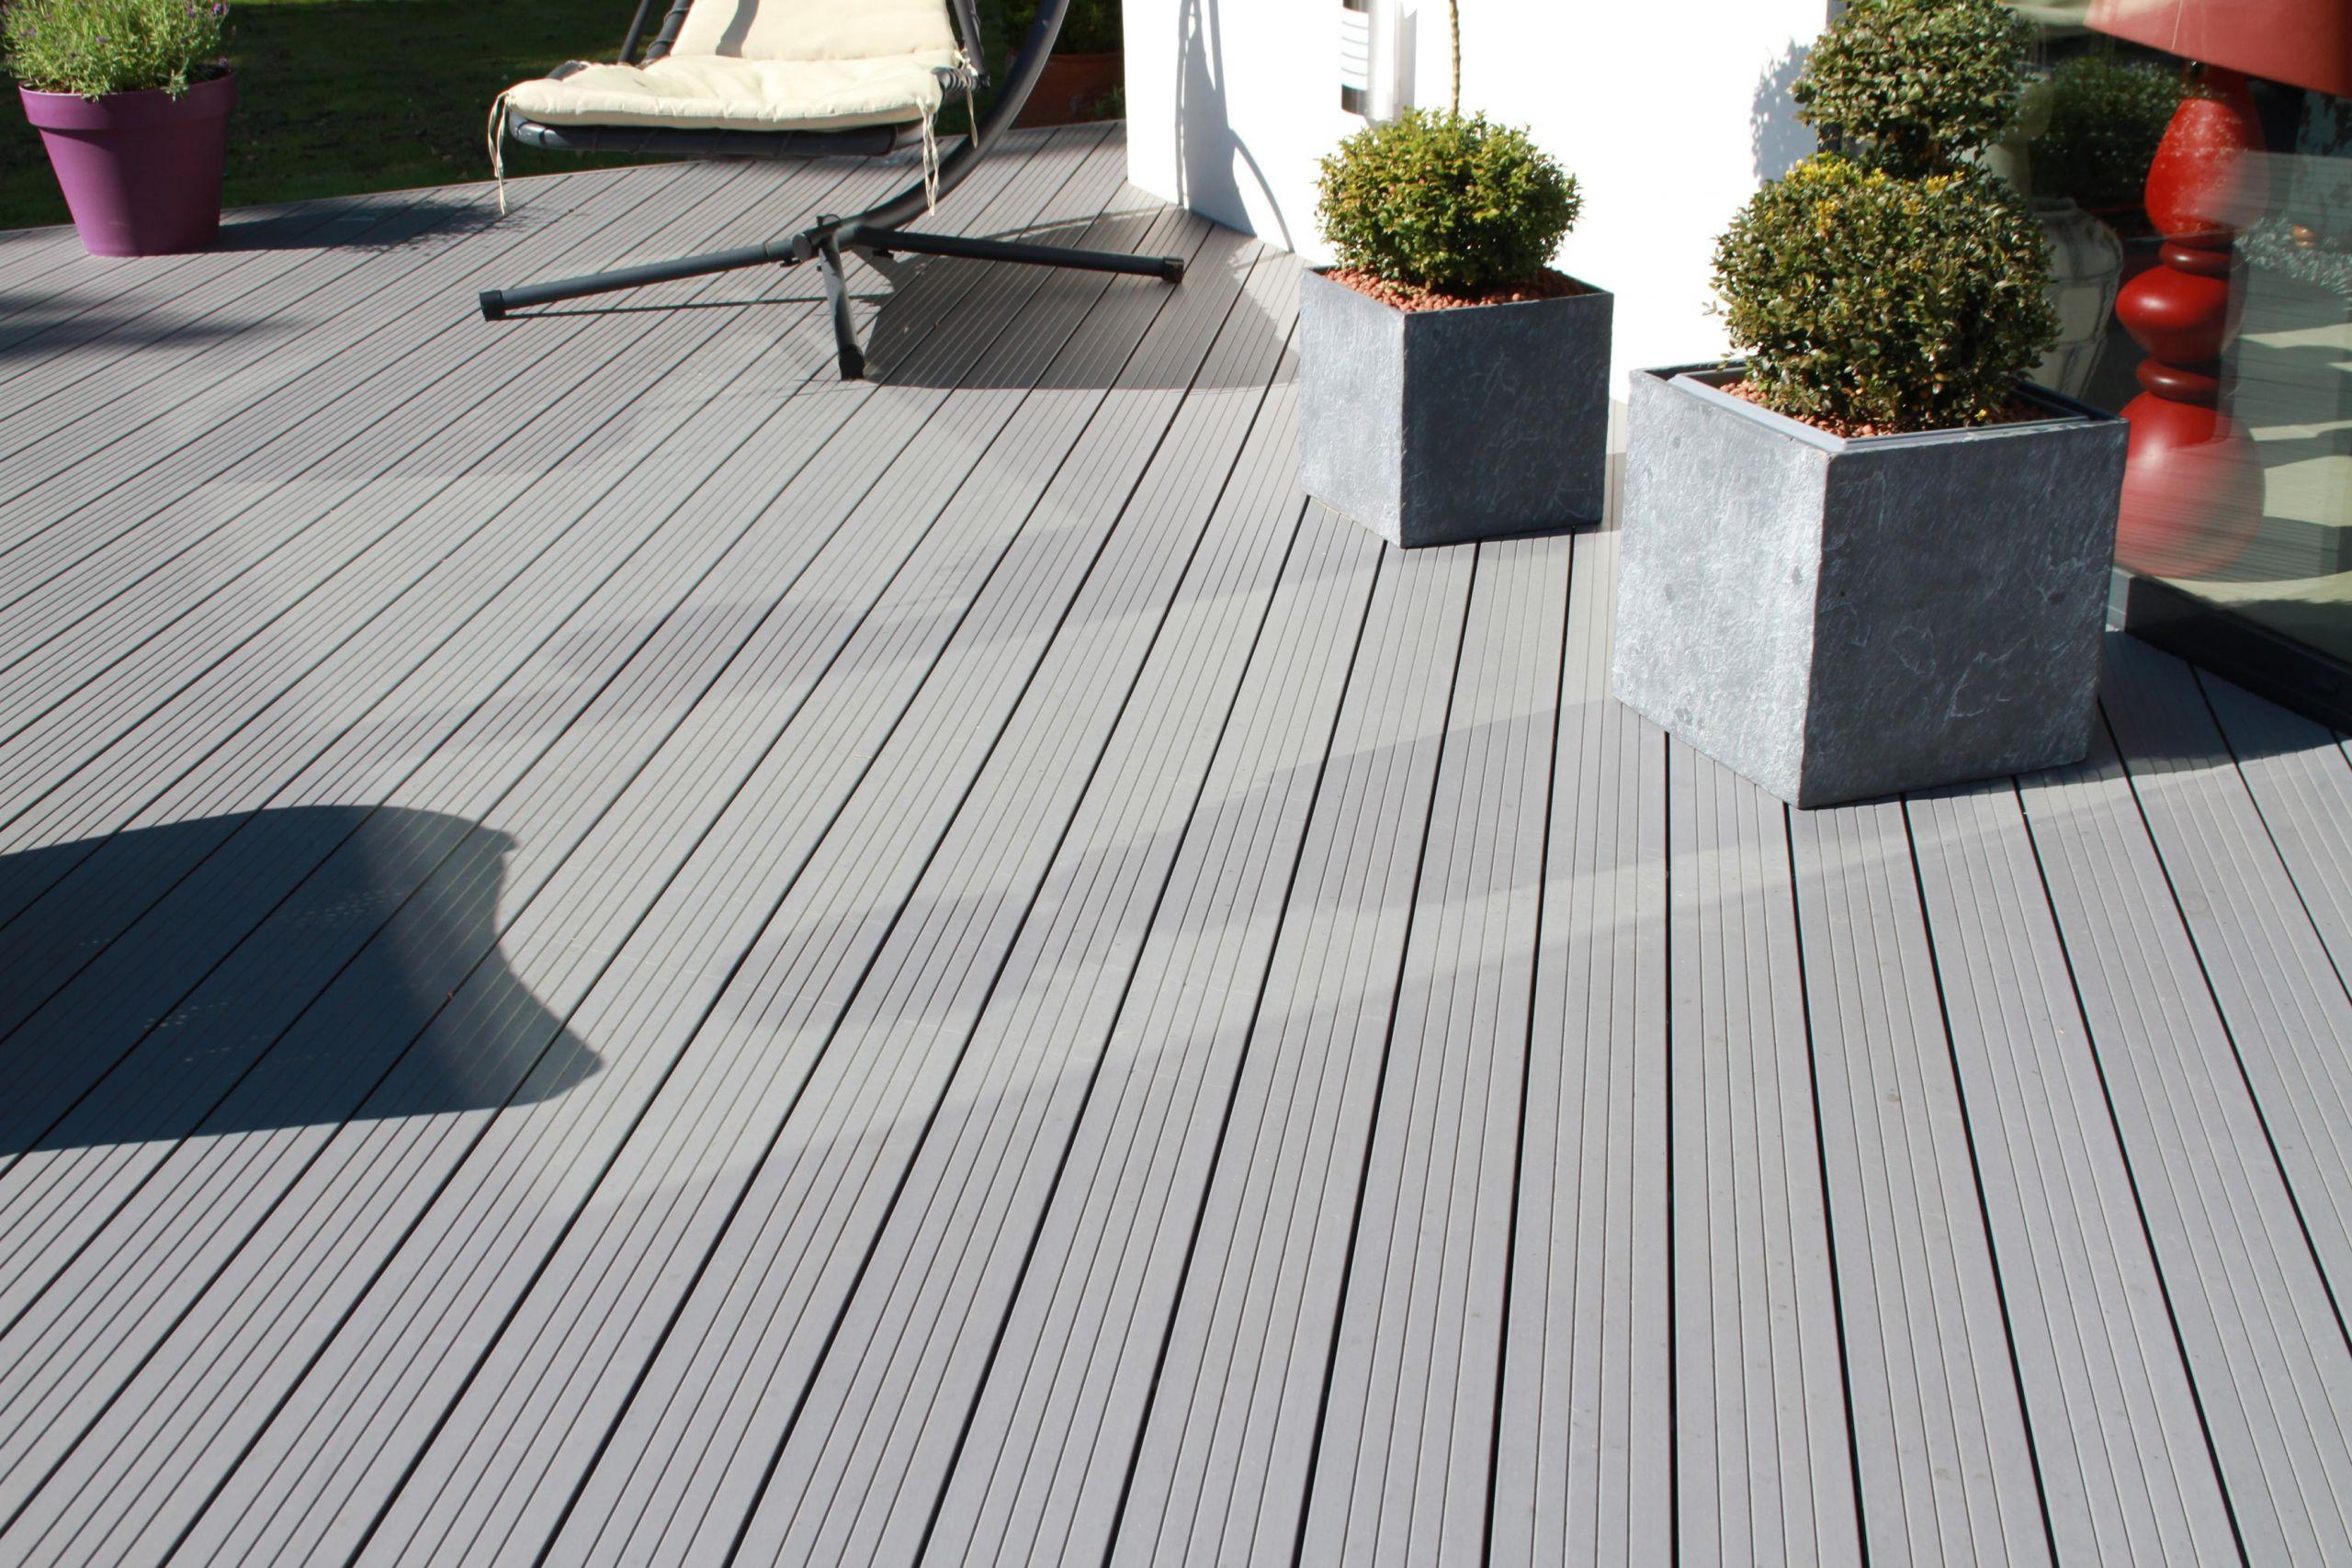 Terrasse bois posite gris prix Nos Conseils